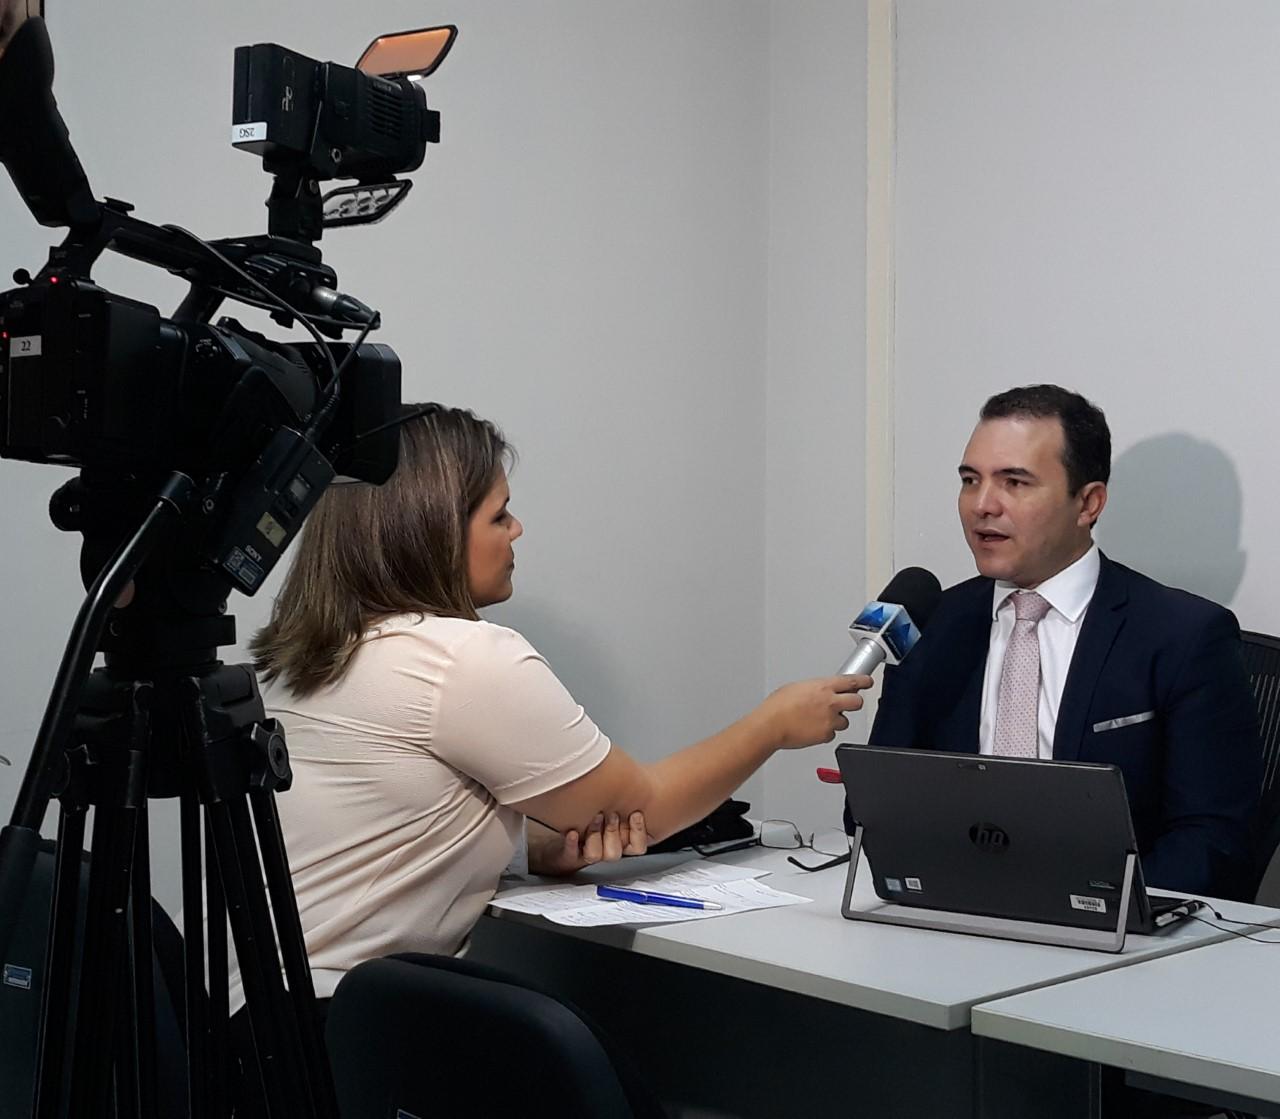 Juiz auxiliar da Corregedoria Nacional de Justiça realiza atendimento a cidadãos